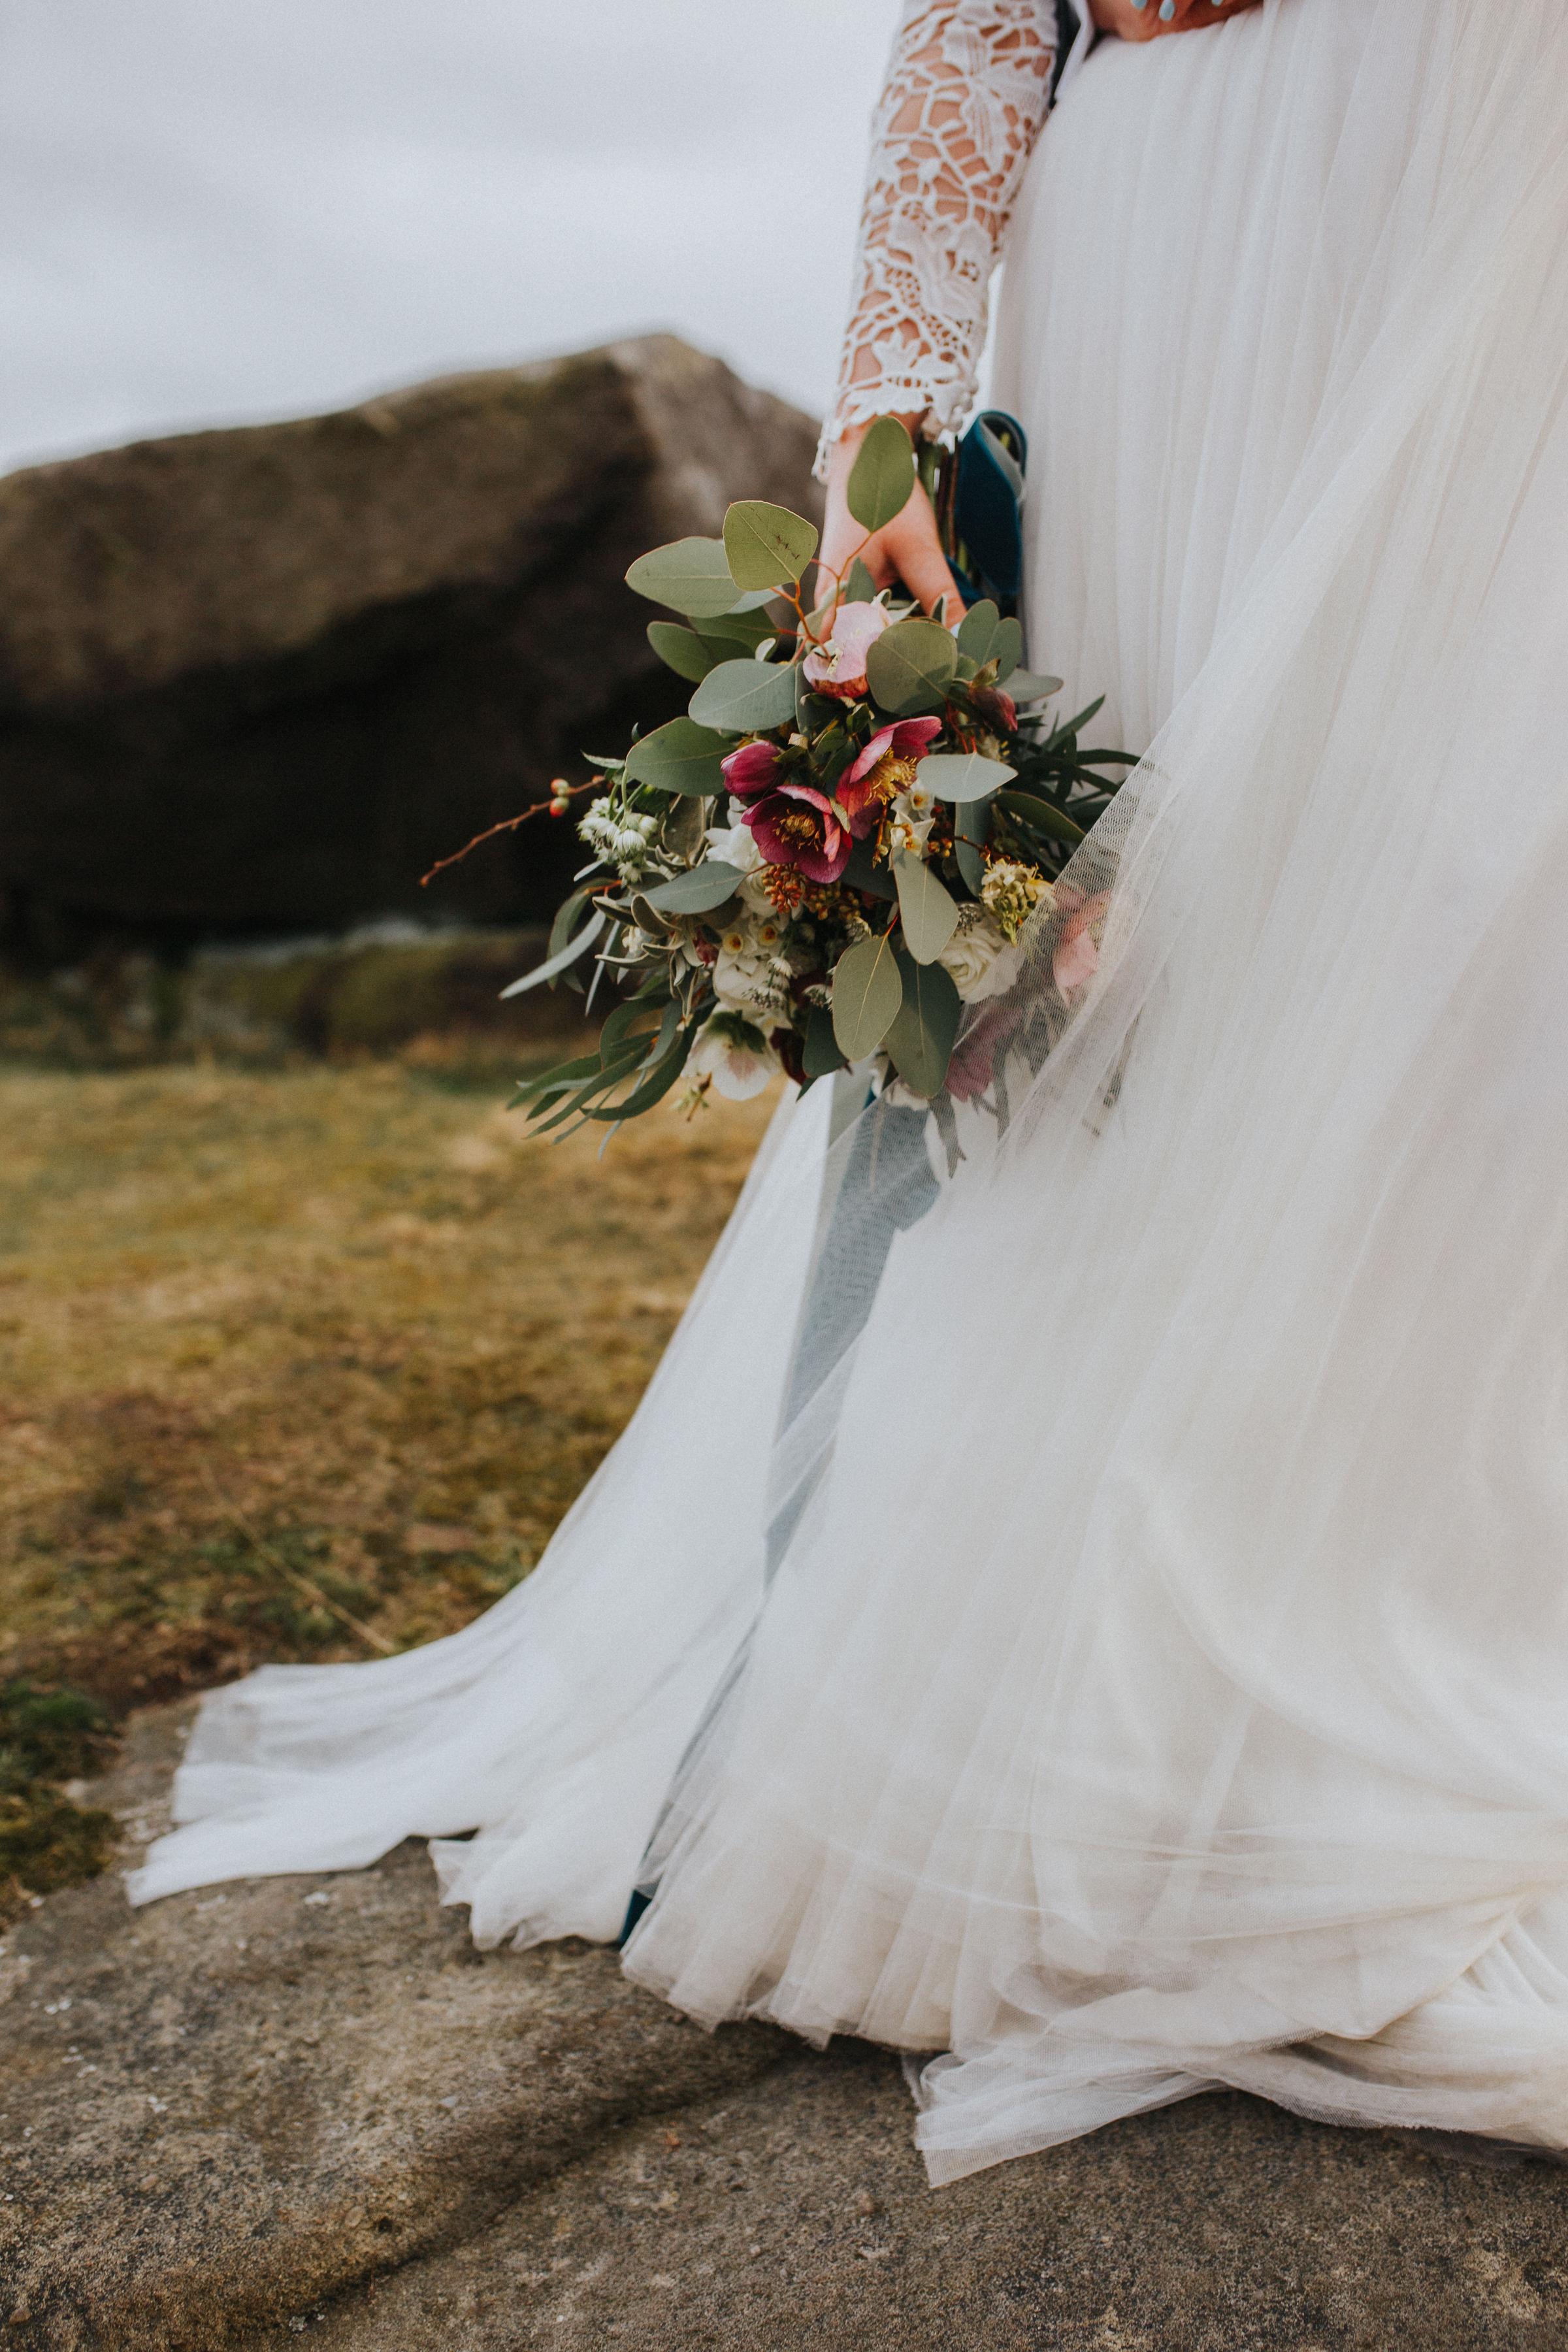 Rosie-bespoke-lace-long sleeved-tulle-wedding-dress-winter-peak district-susanna greening-23.jpg